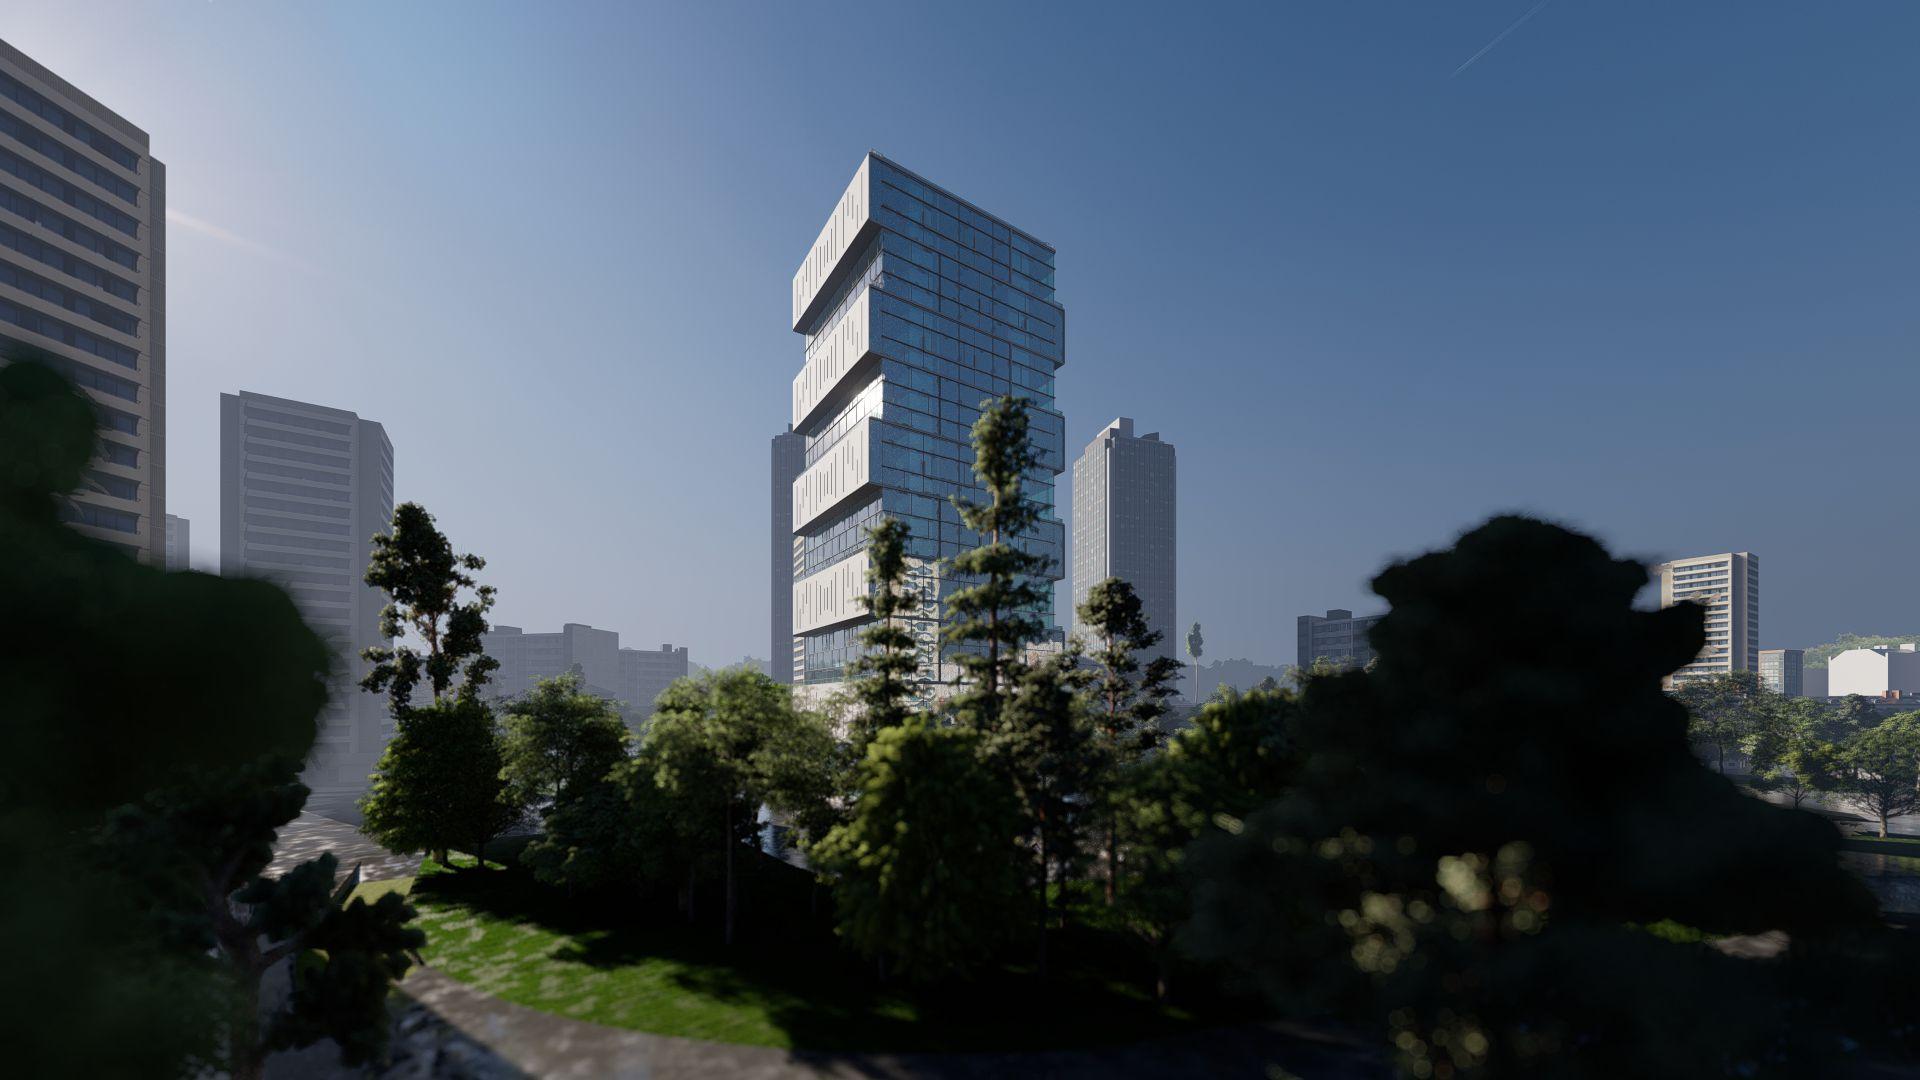 arhitektuurne 3d visualiseerimine pilve hoone 2 17